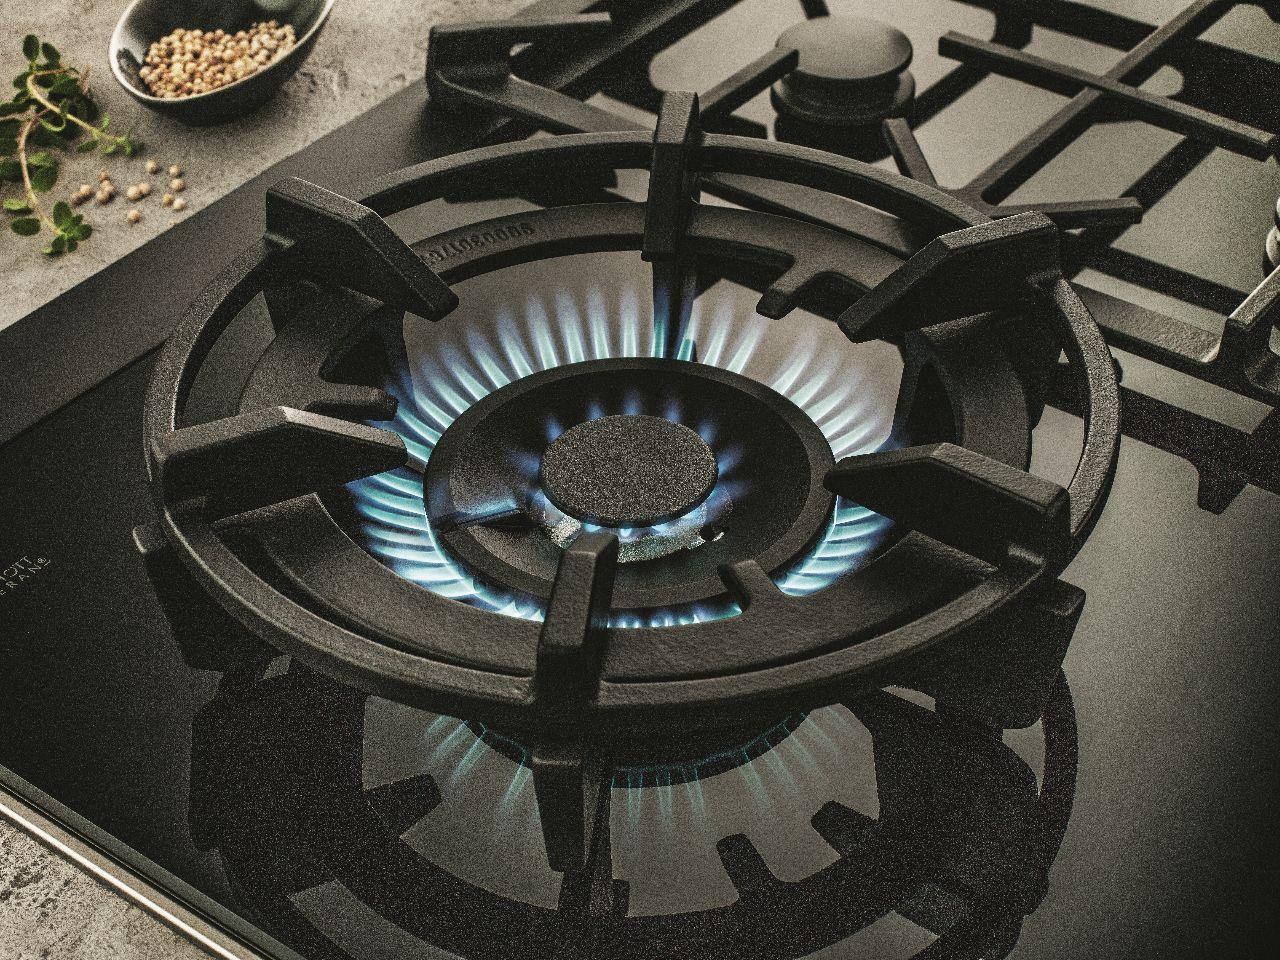 Nieuwe gaskookplaat met wokbrander van Neff